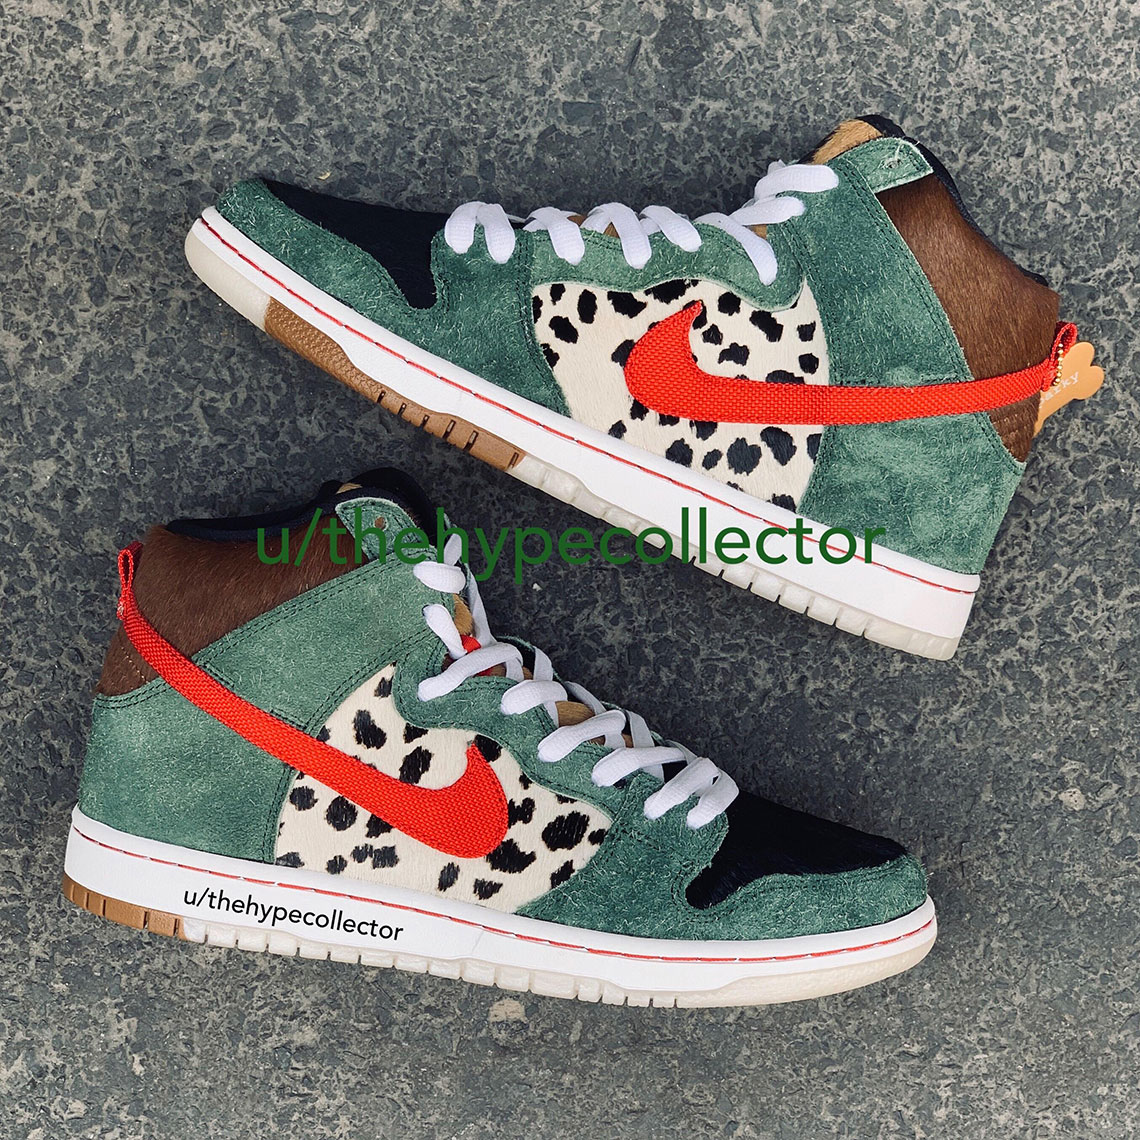 Nike SB Dunk High Dog Walker 420 Release Date